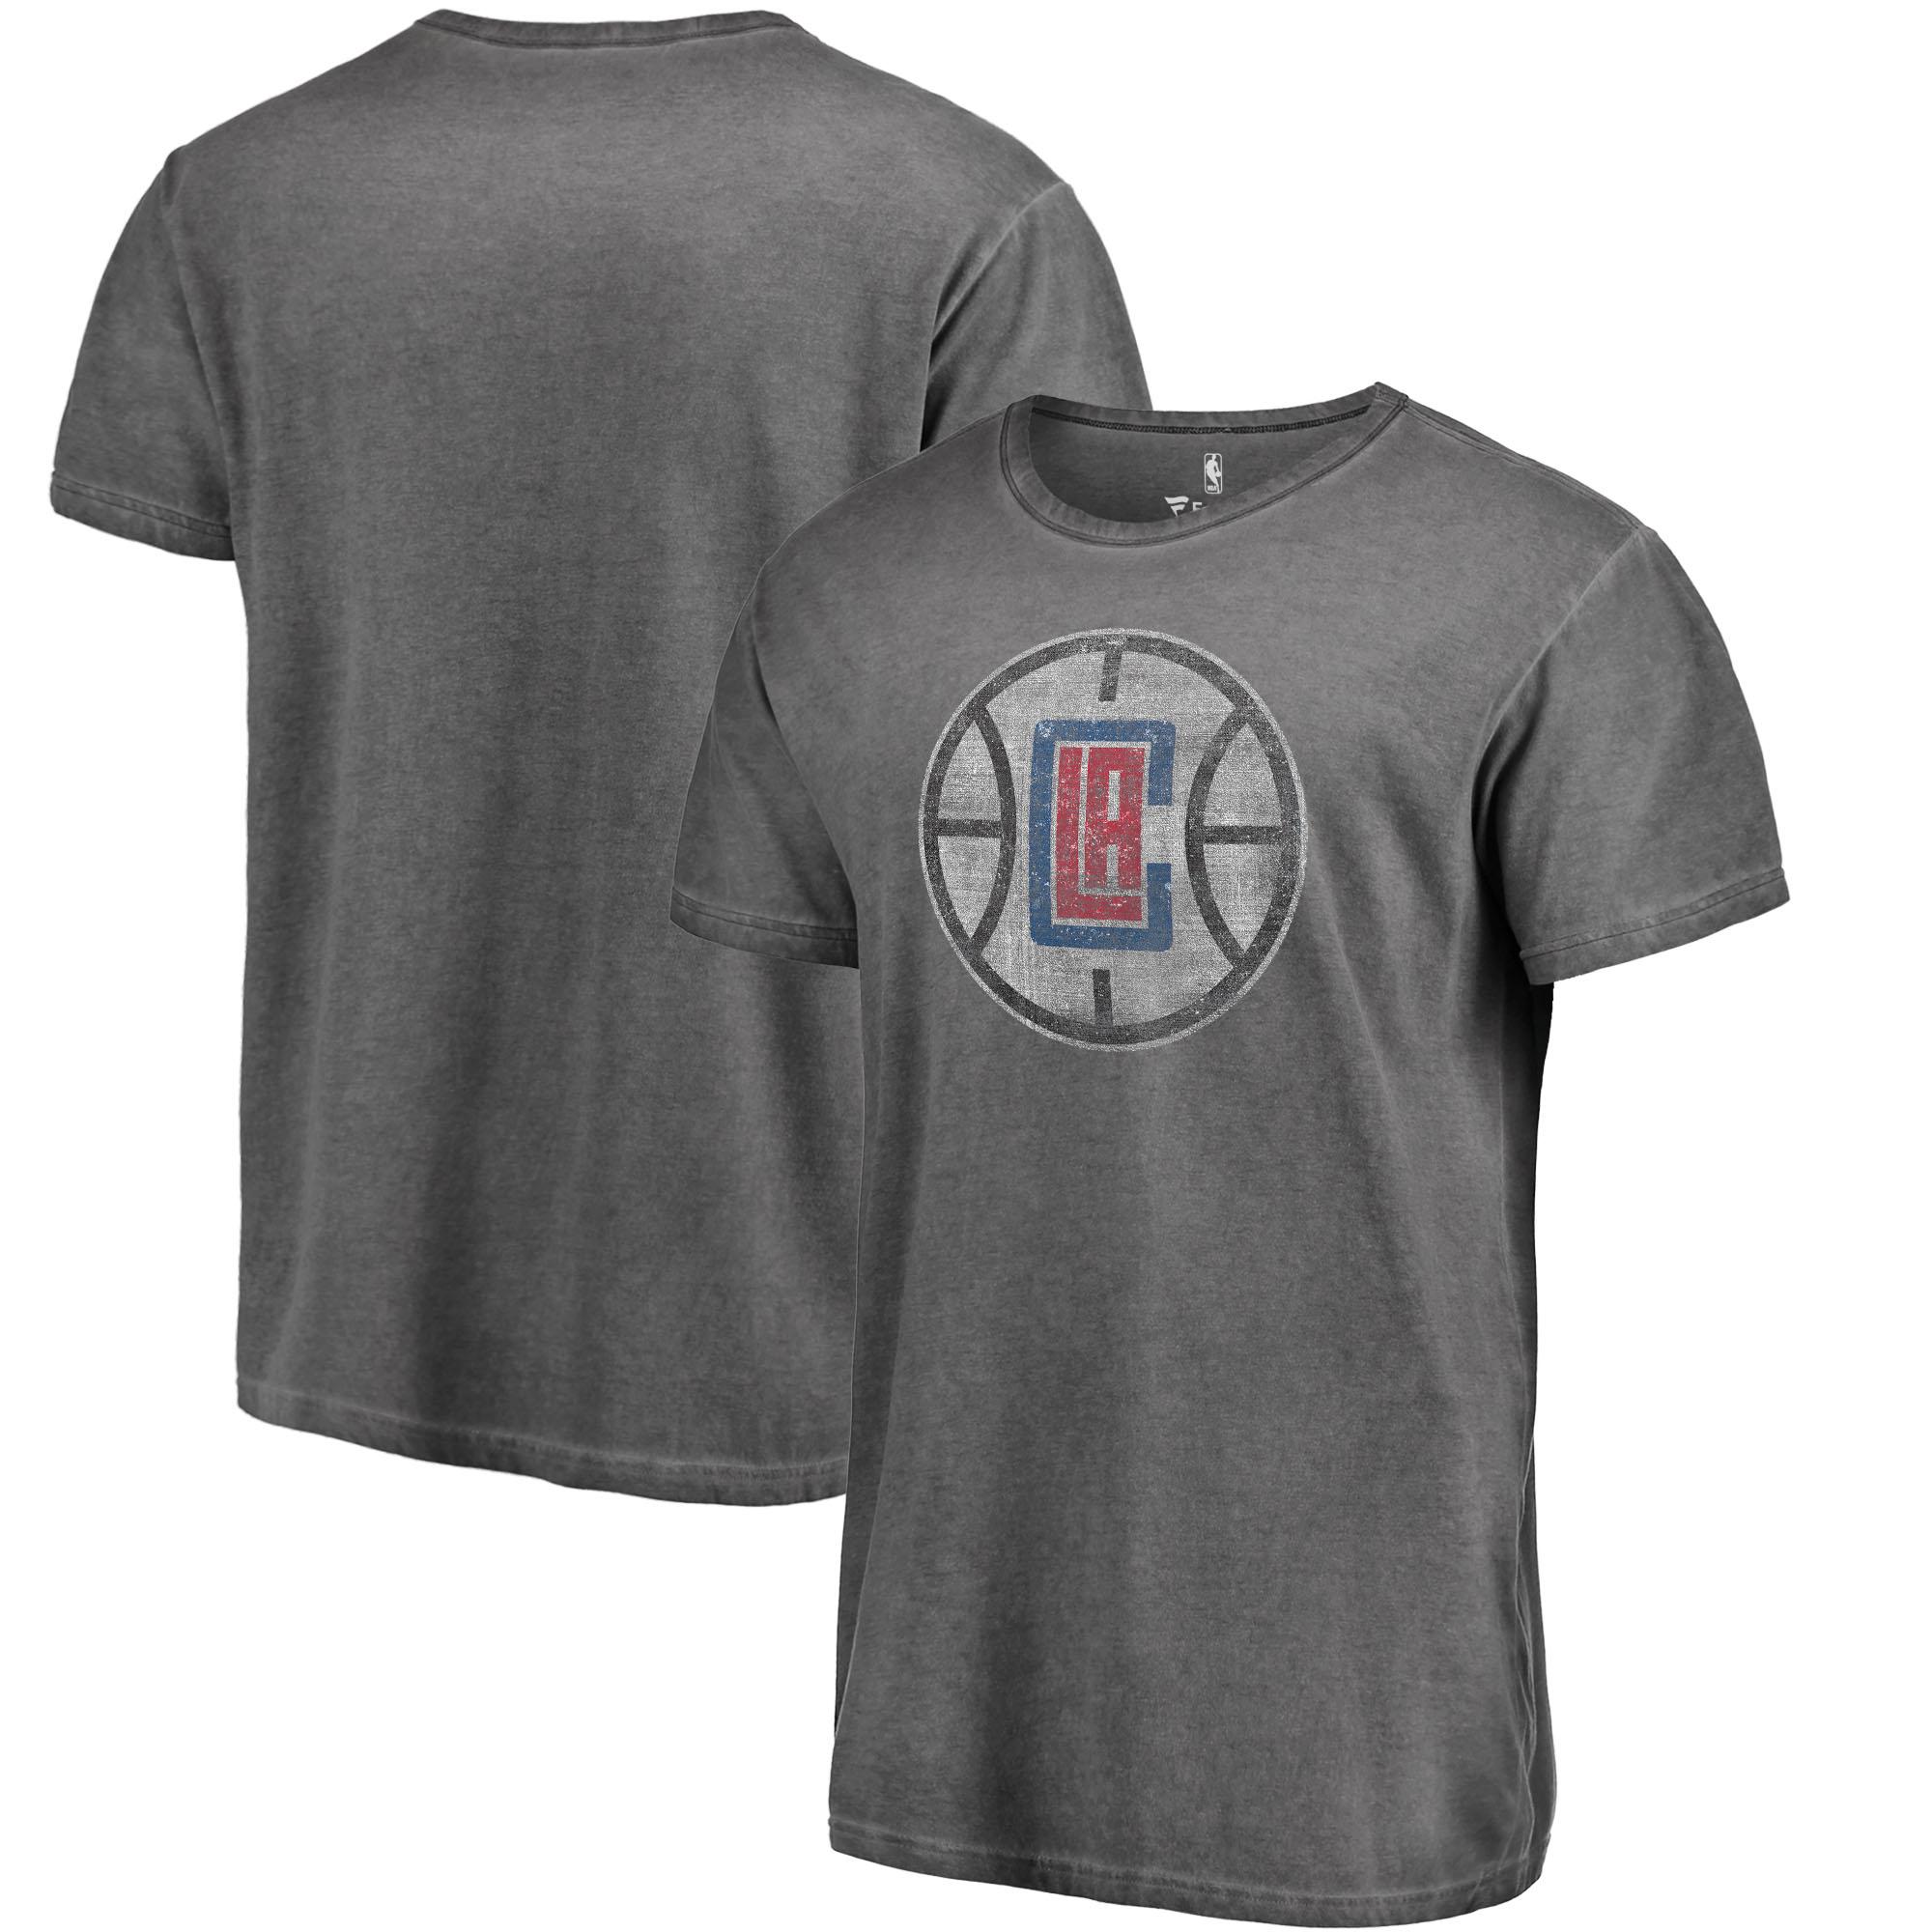 LA Clippers Fanatics Branded Shadow Washed Logo T-Shirt - Black